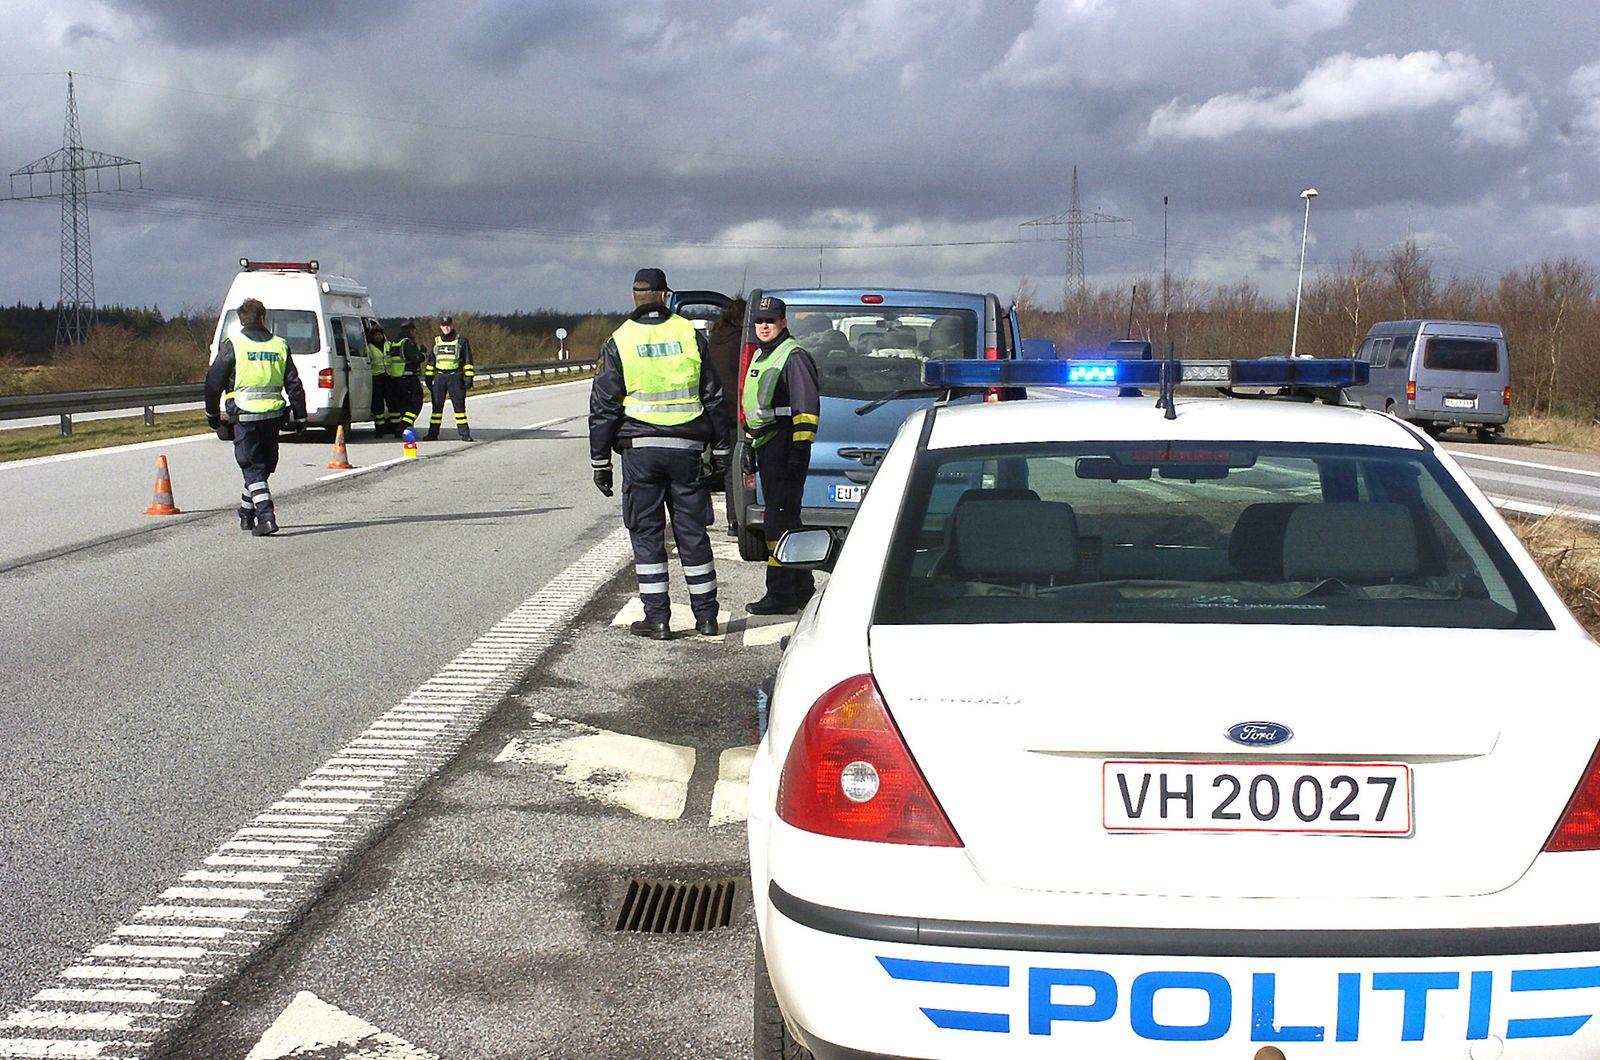 Dänemark / Polizei